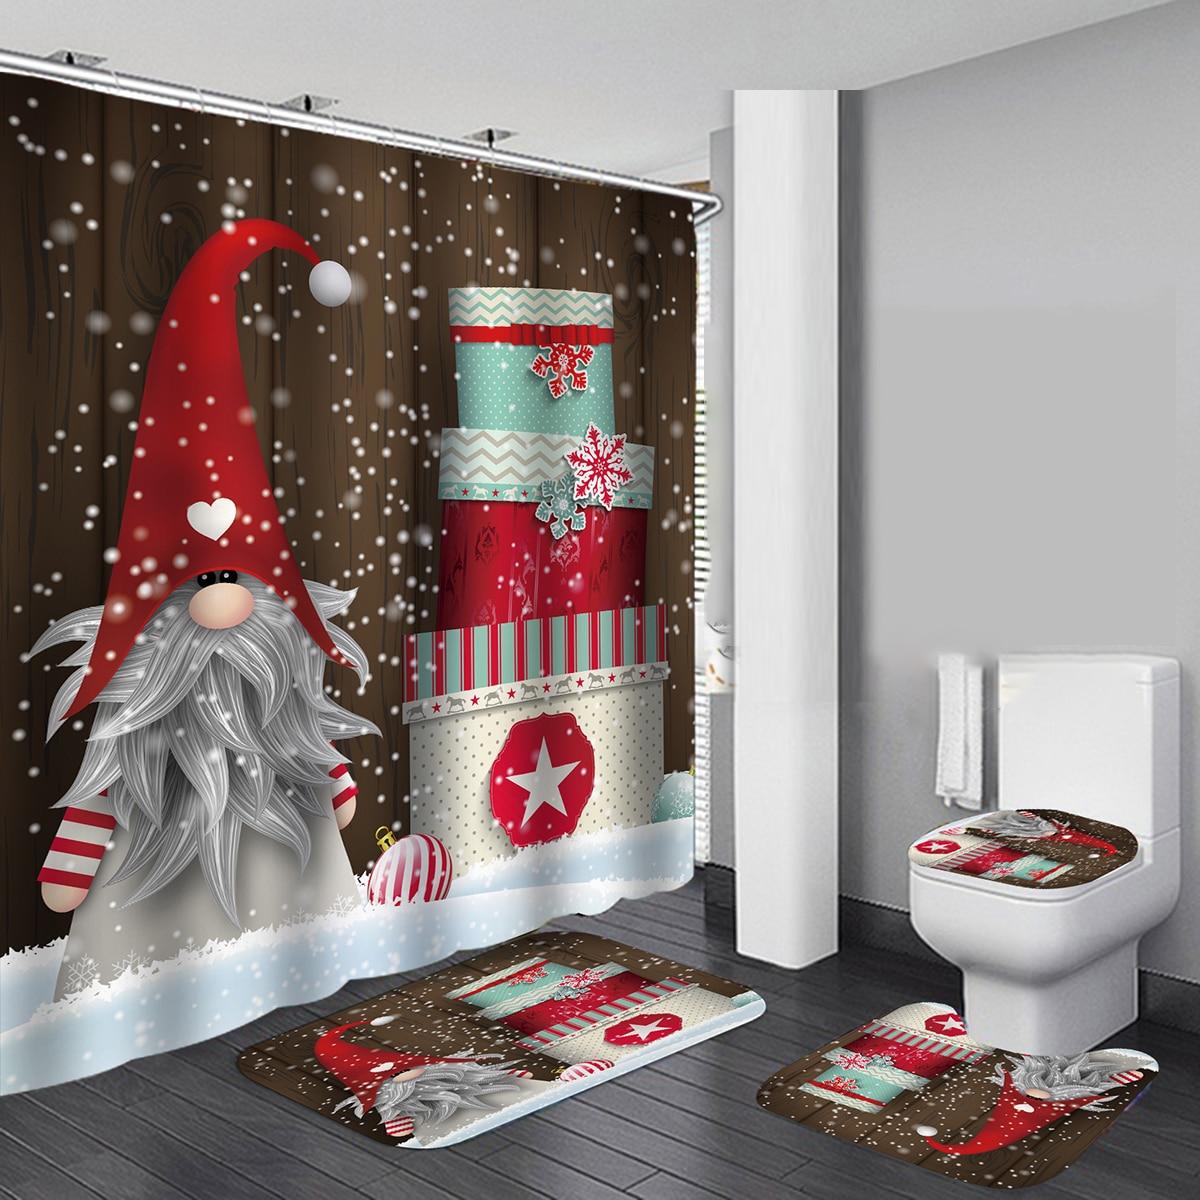 Christmas Fireplace Print Waterproof Bathroom Shower Curtain Toilet Cover Mats